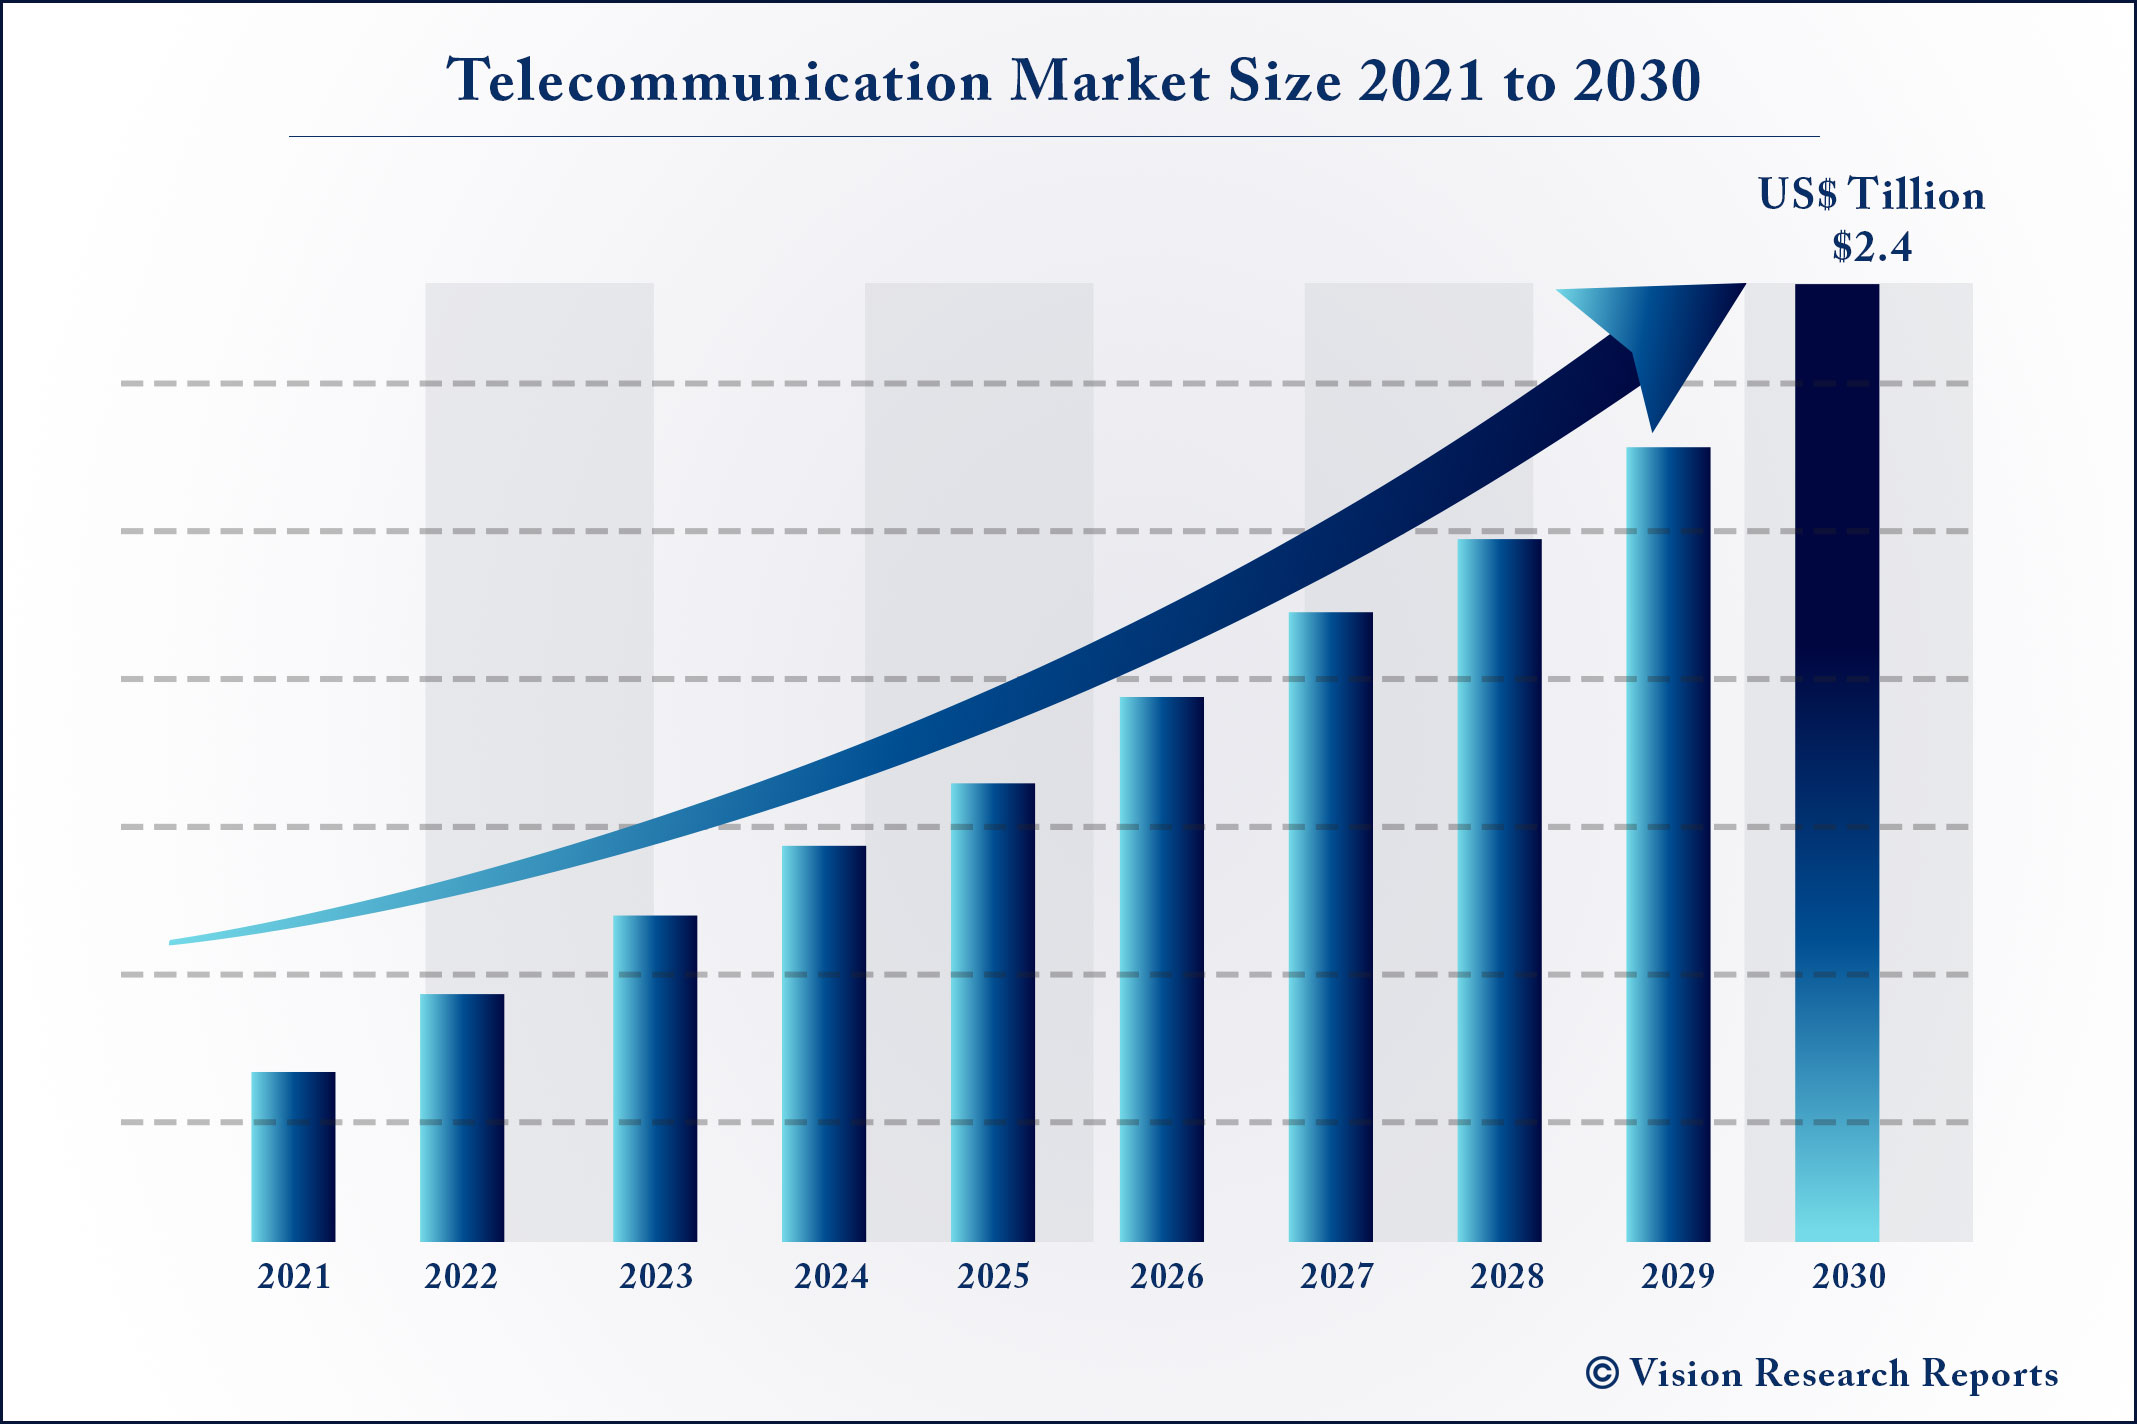 Telecommunication Market Size 2021 to 2030